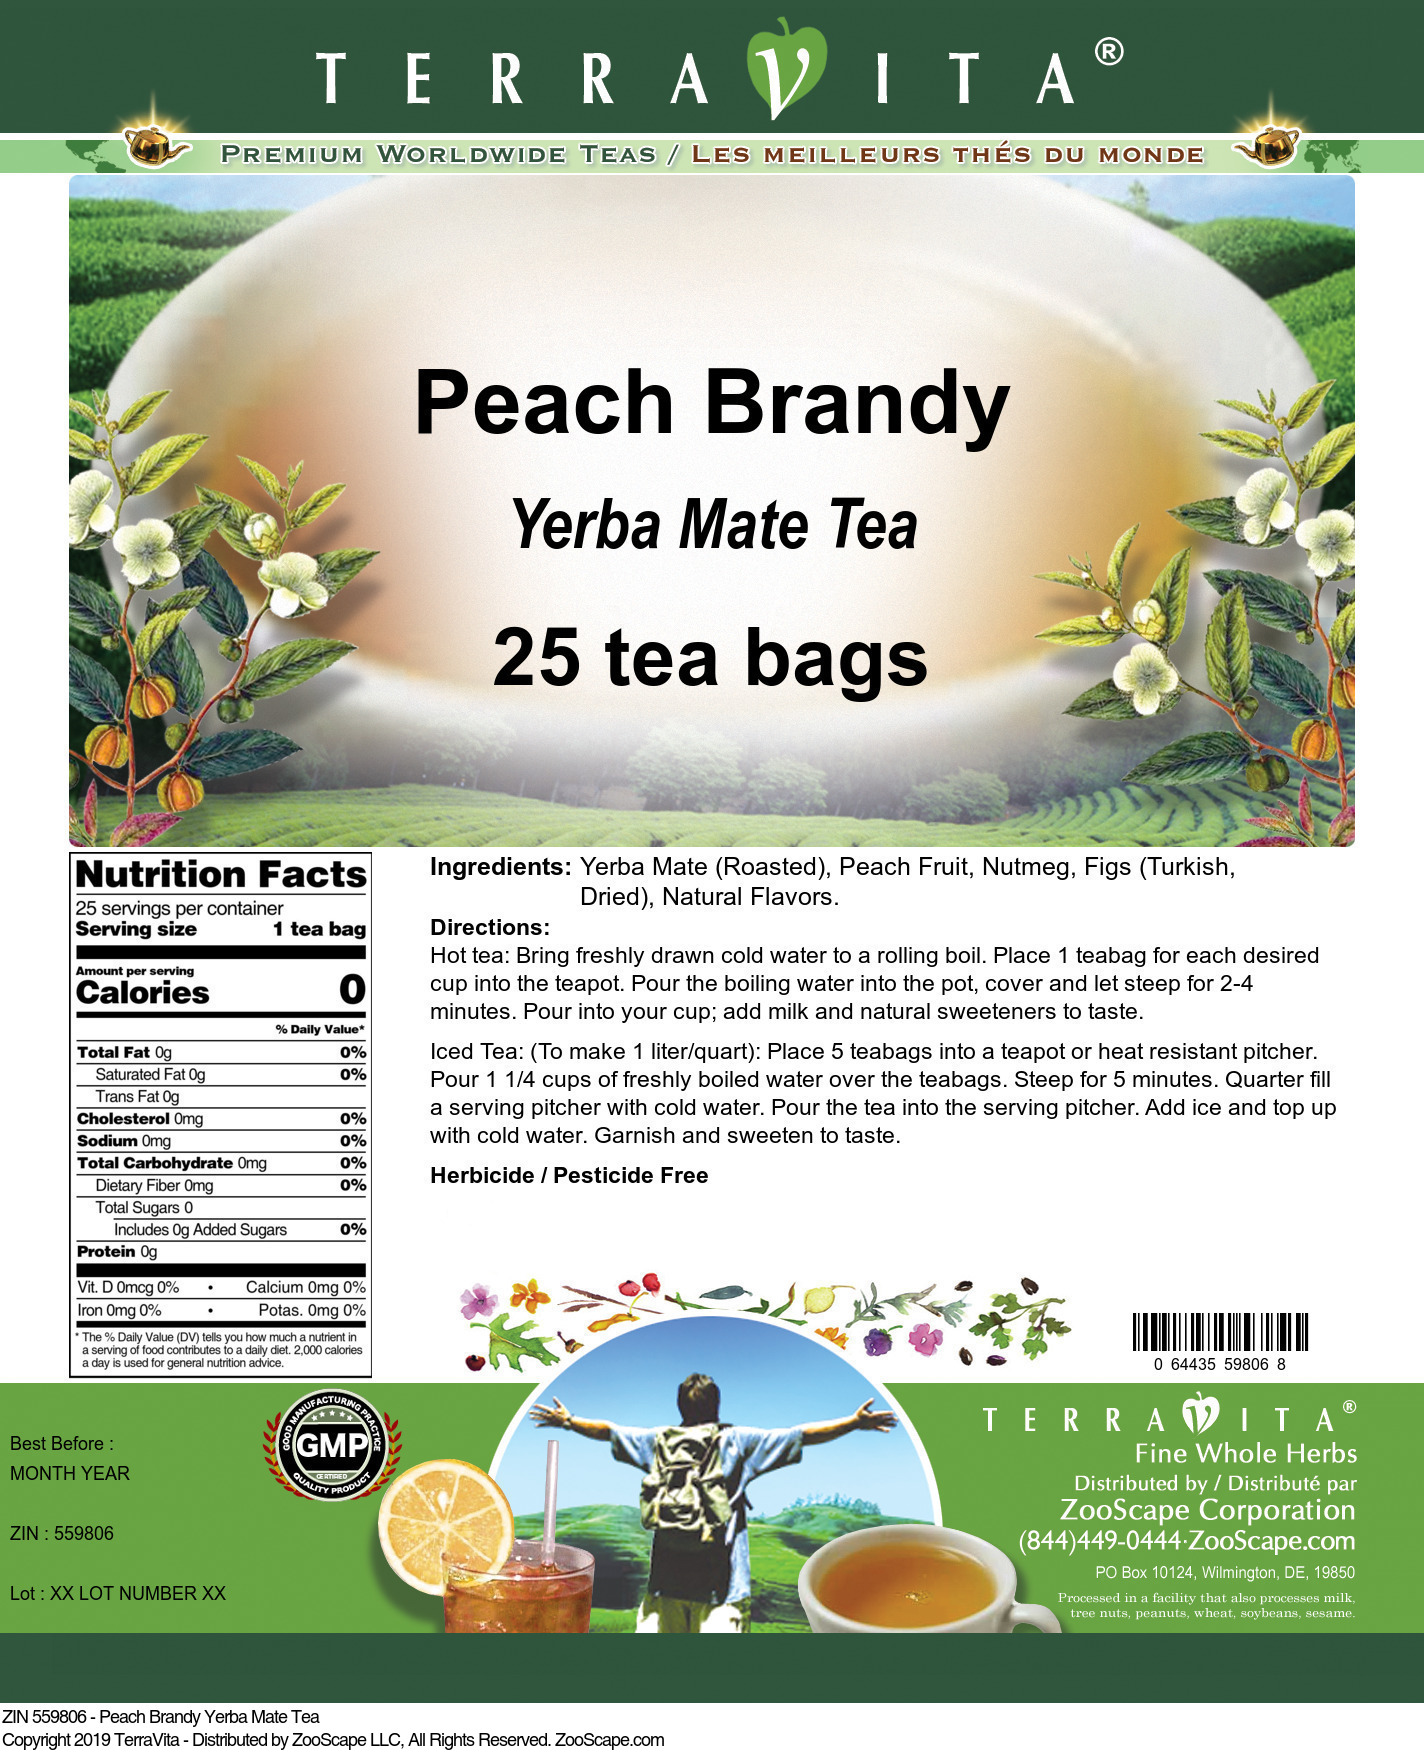 Peach Brandy Yerba Mate